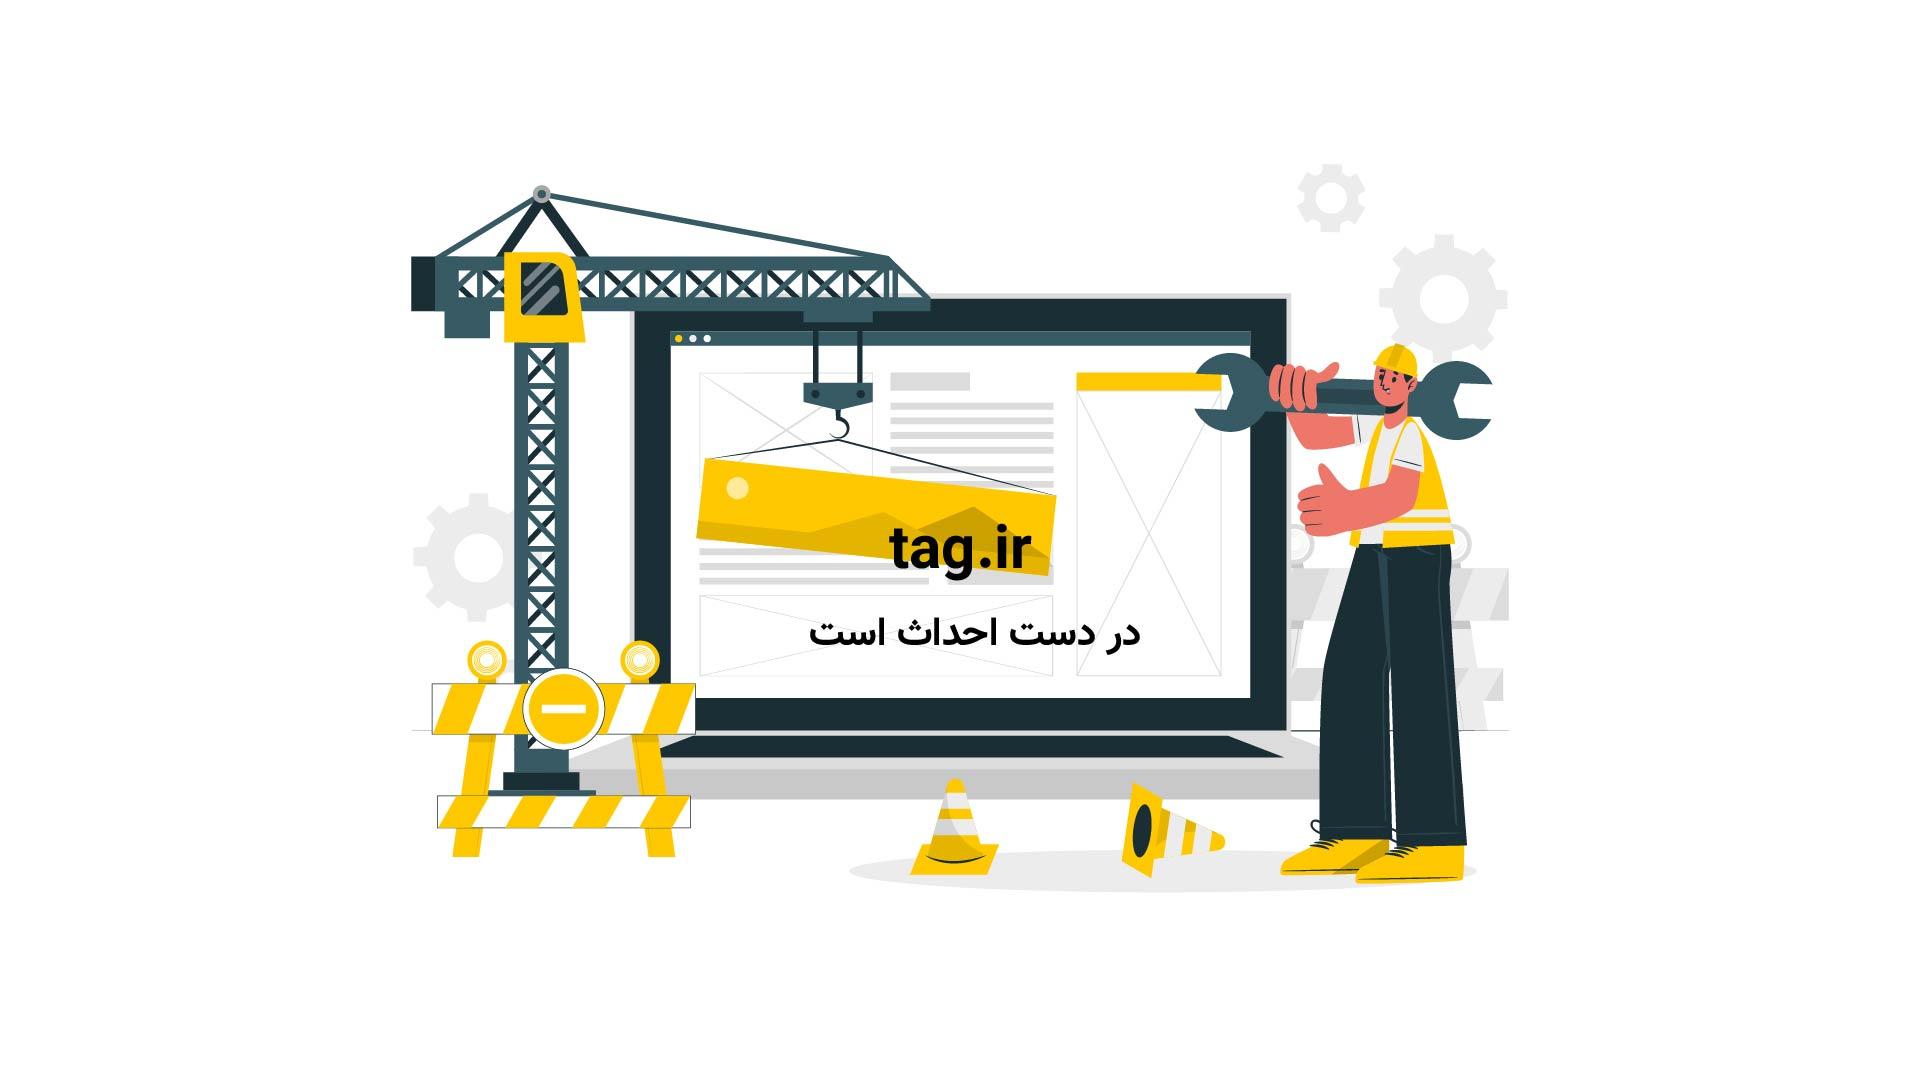 دایناسور | تگ